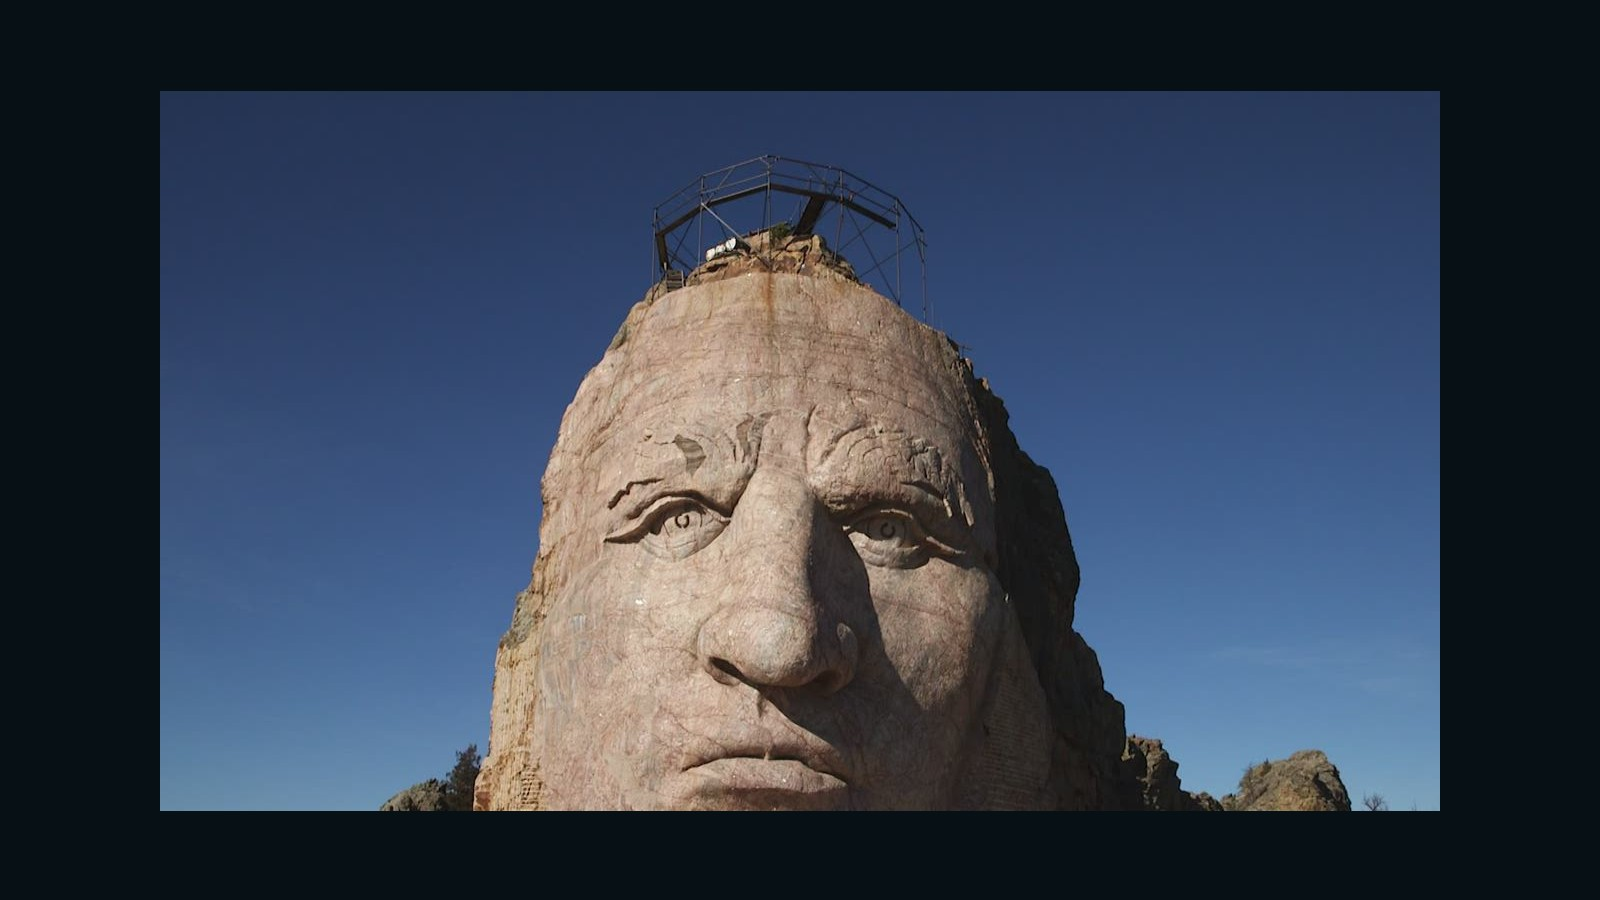 Crazy Horse Memorial bigger than Mount Rushmore - CNN Video